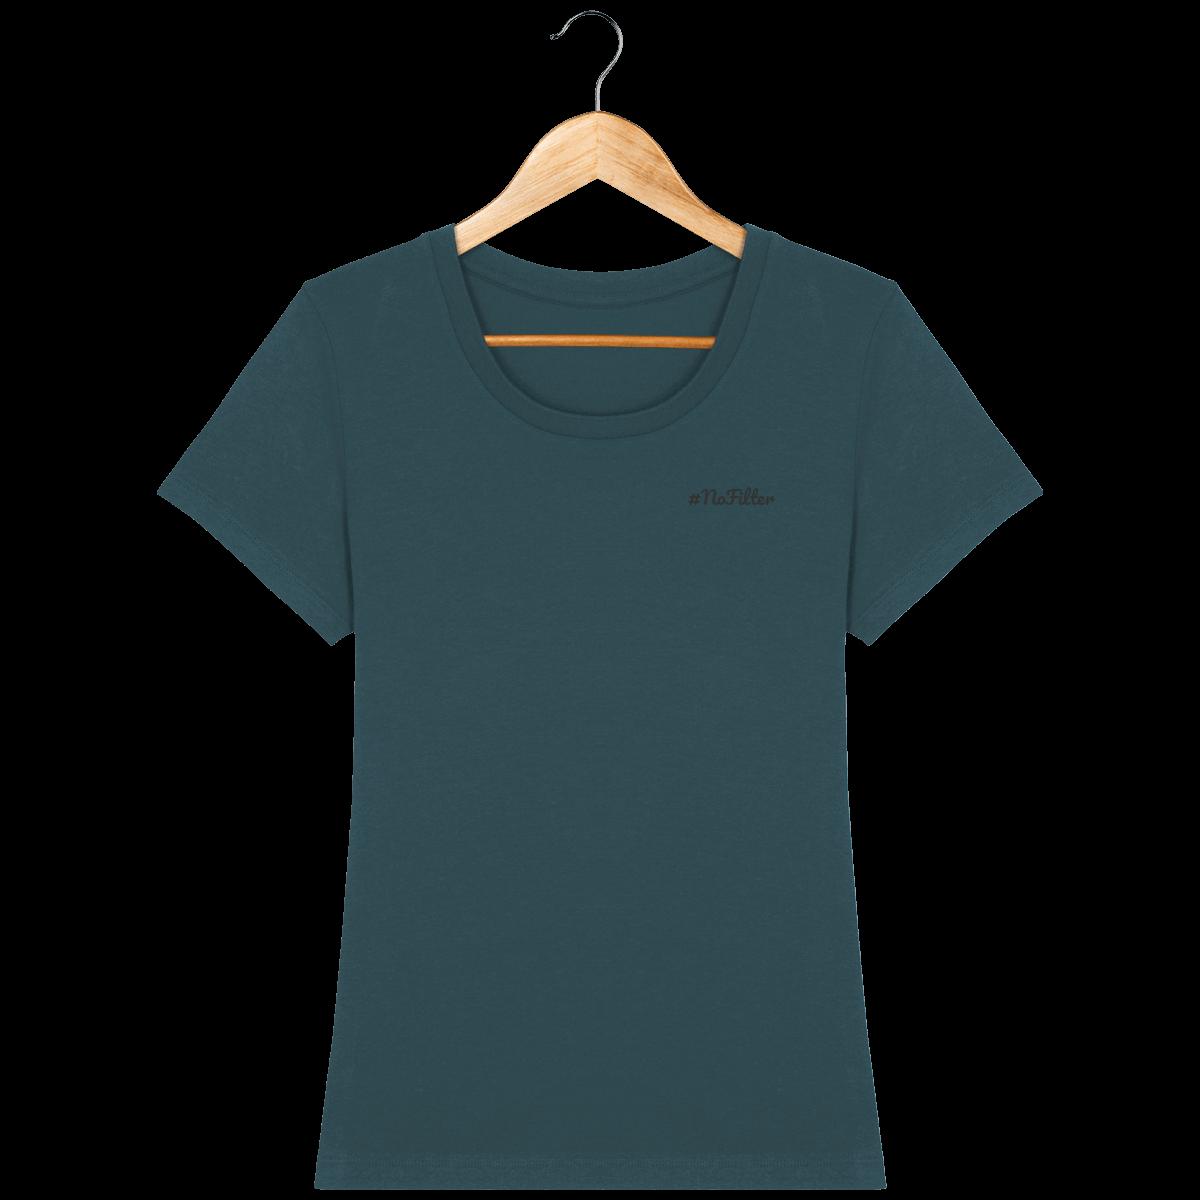 t-shirt-bio-brode-nofilter-caribbeanblue-darkgrey_stargazer_face